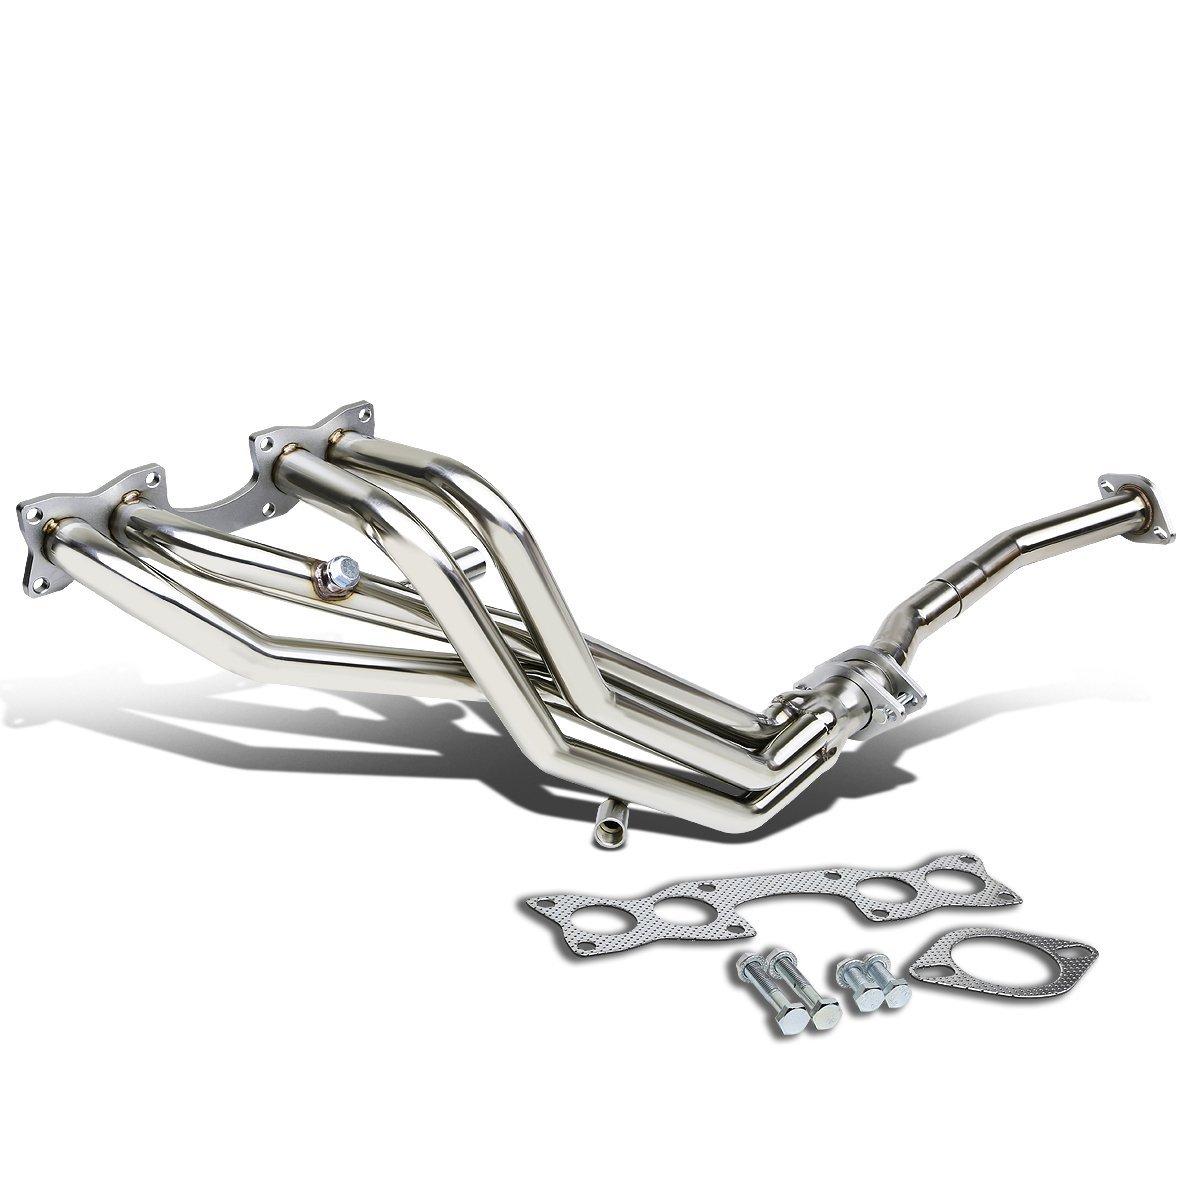 hight resolution of for 90 97 nissan d21 hardbody pickup 2 4l chrome 4 1 performance header exhaust manifold walmart com